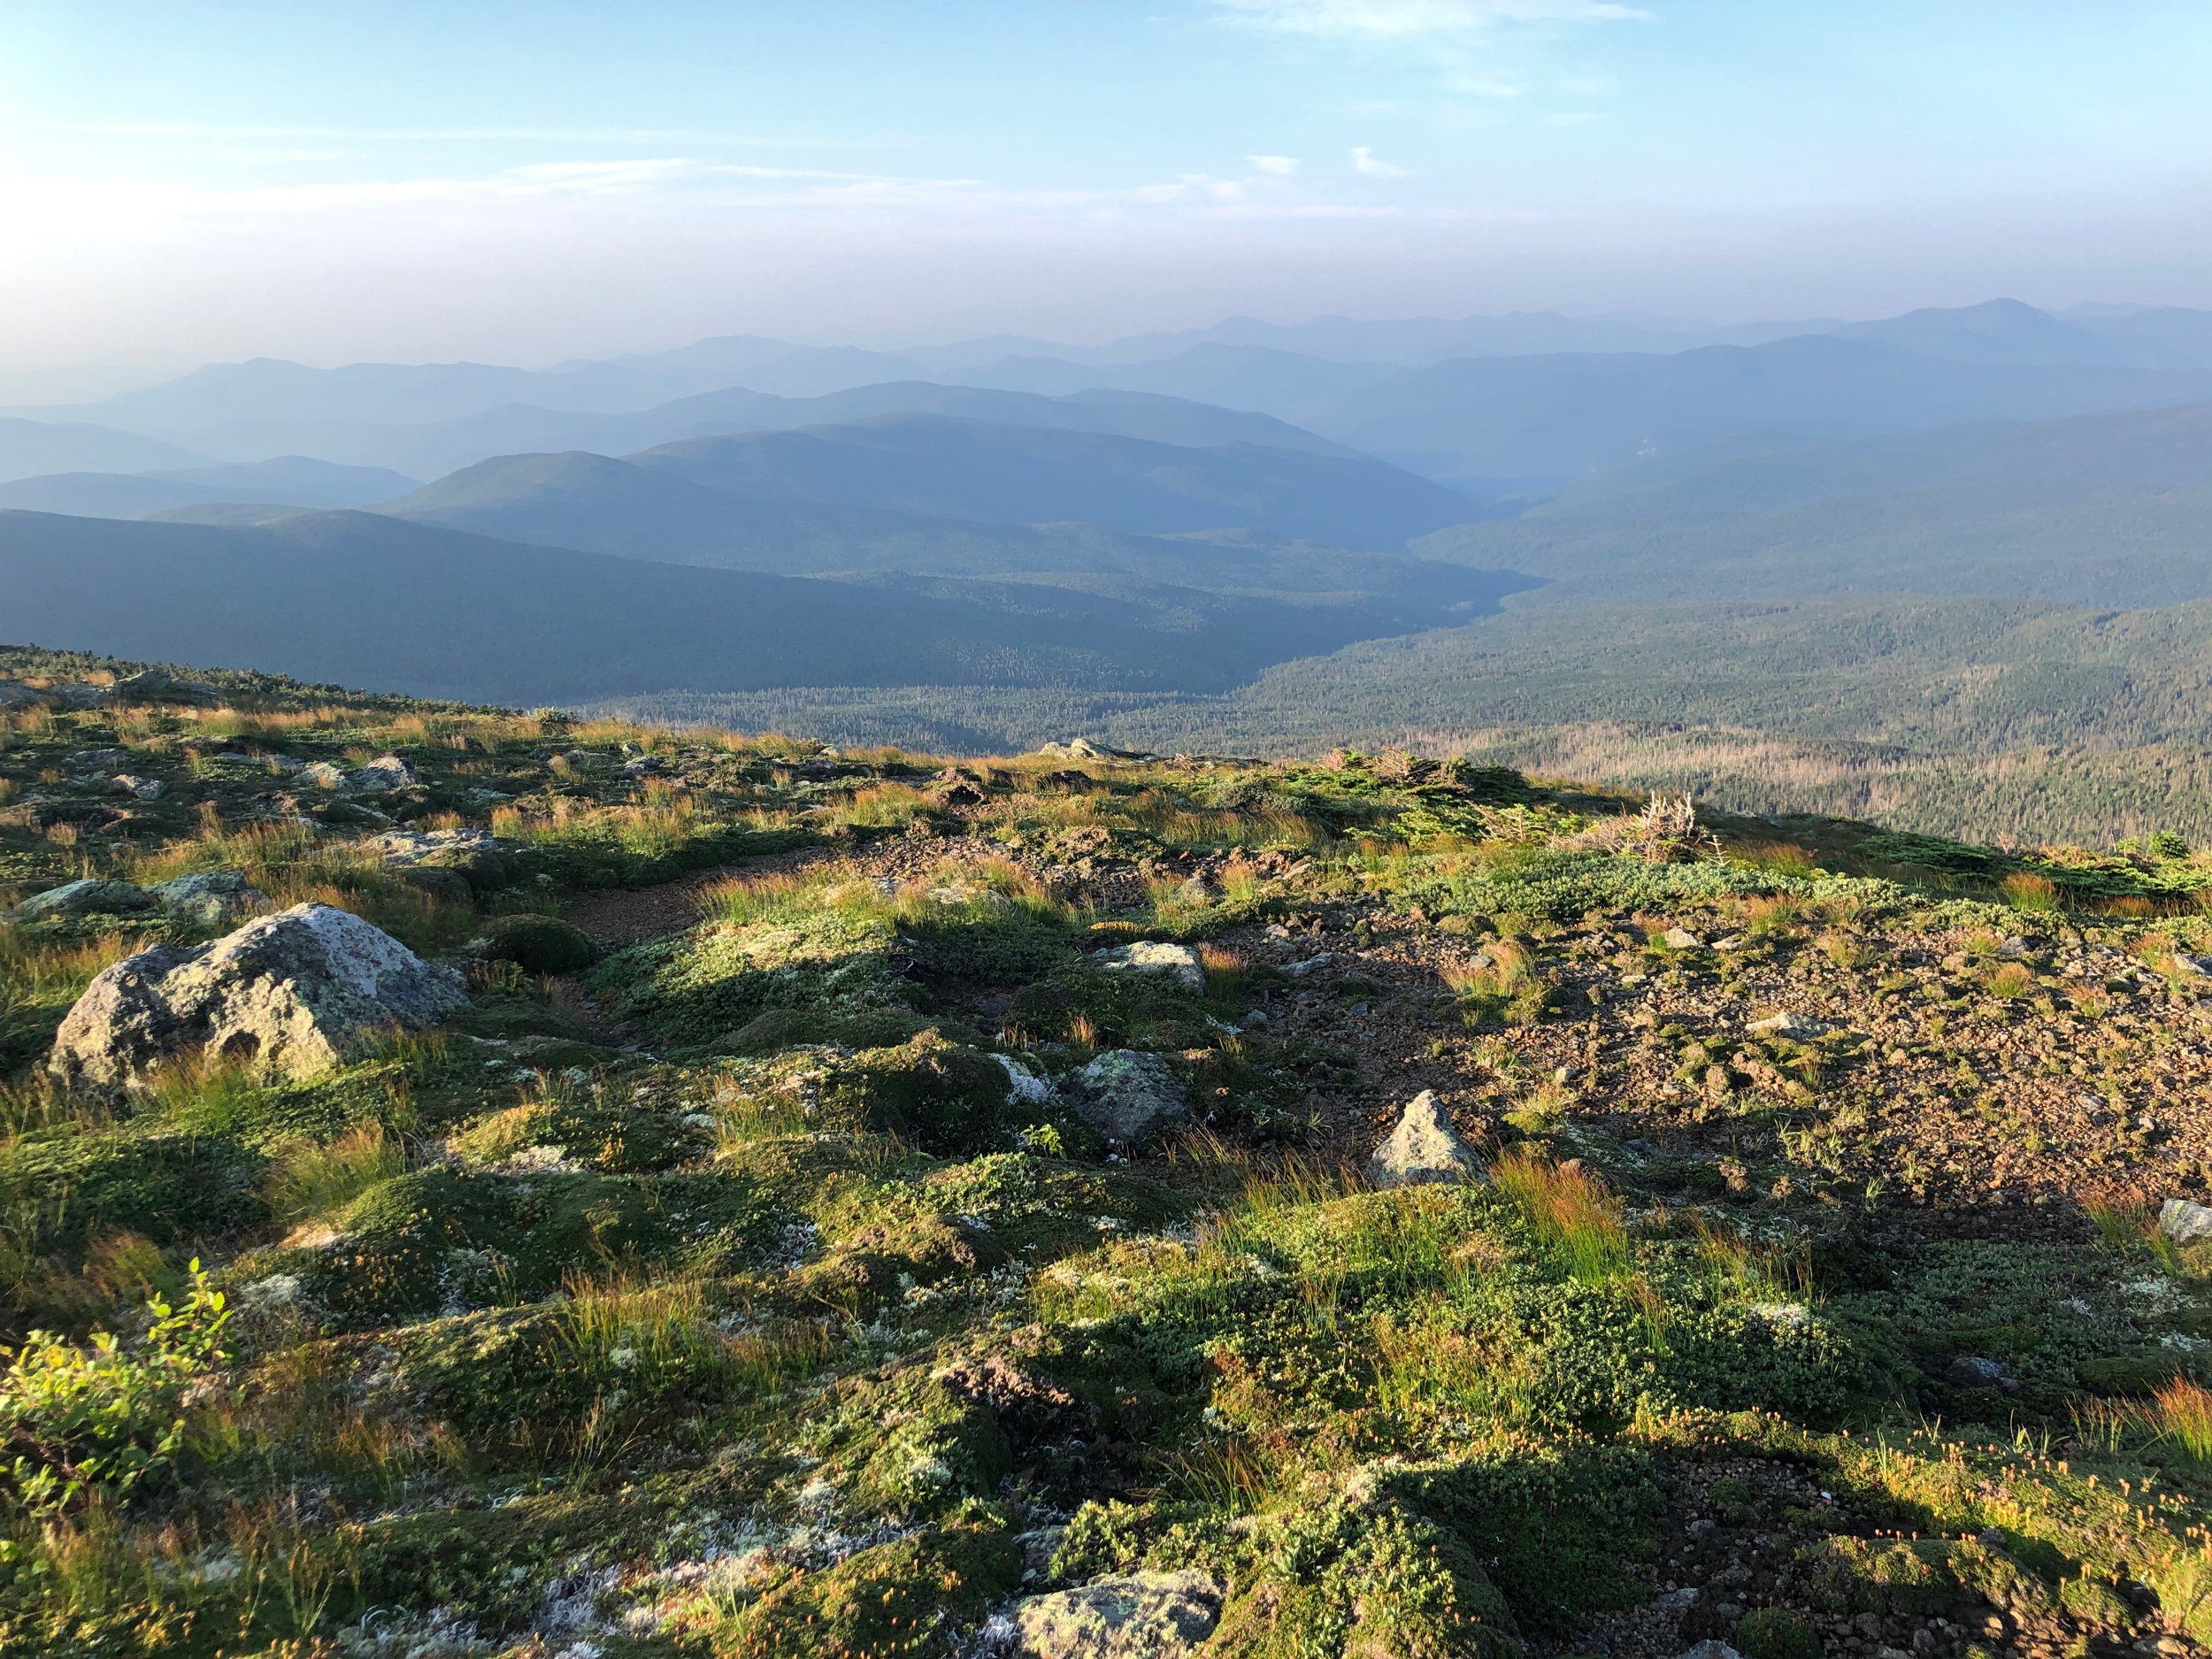 Going Down Mt. Washington